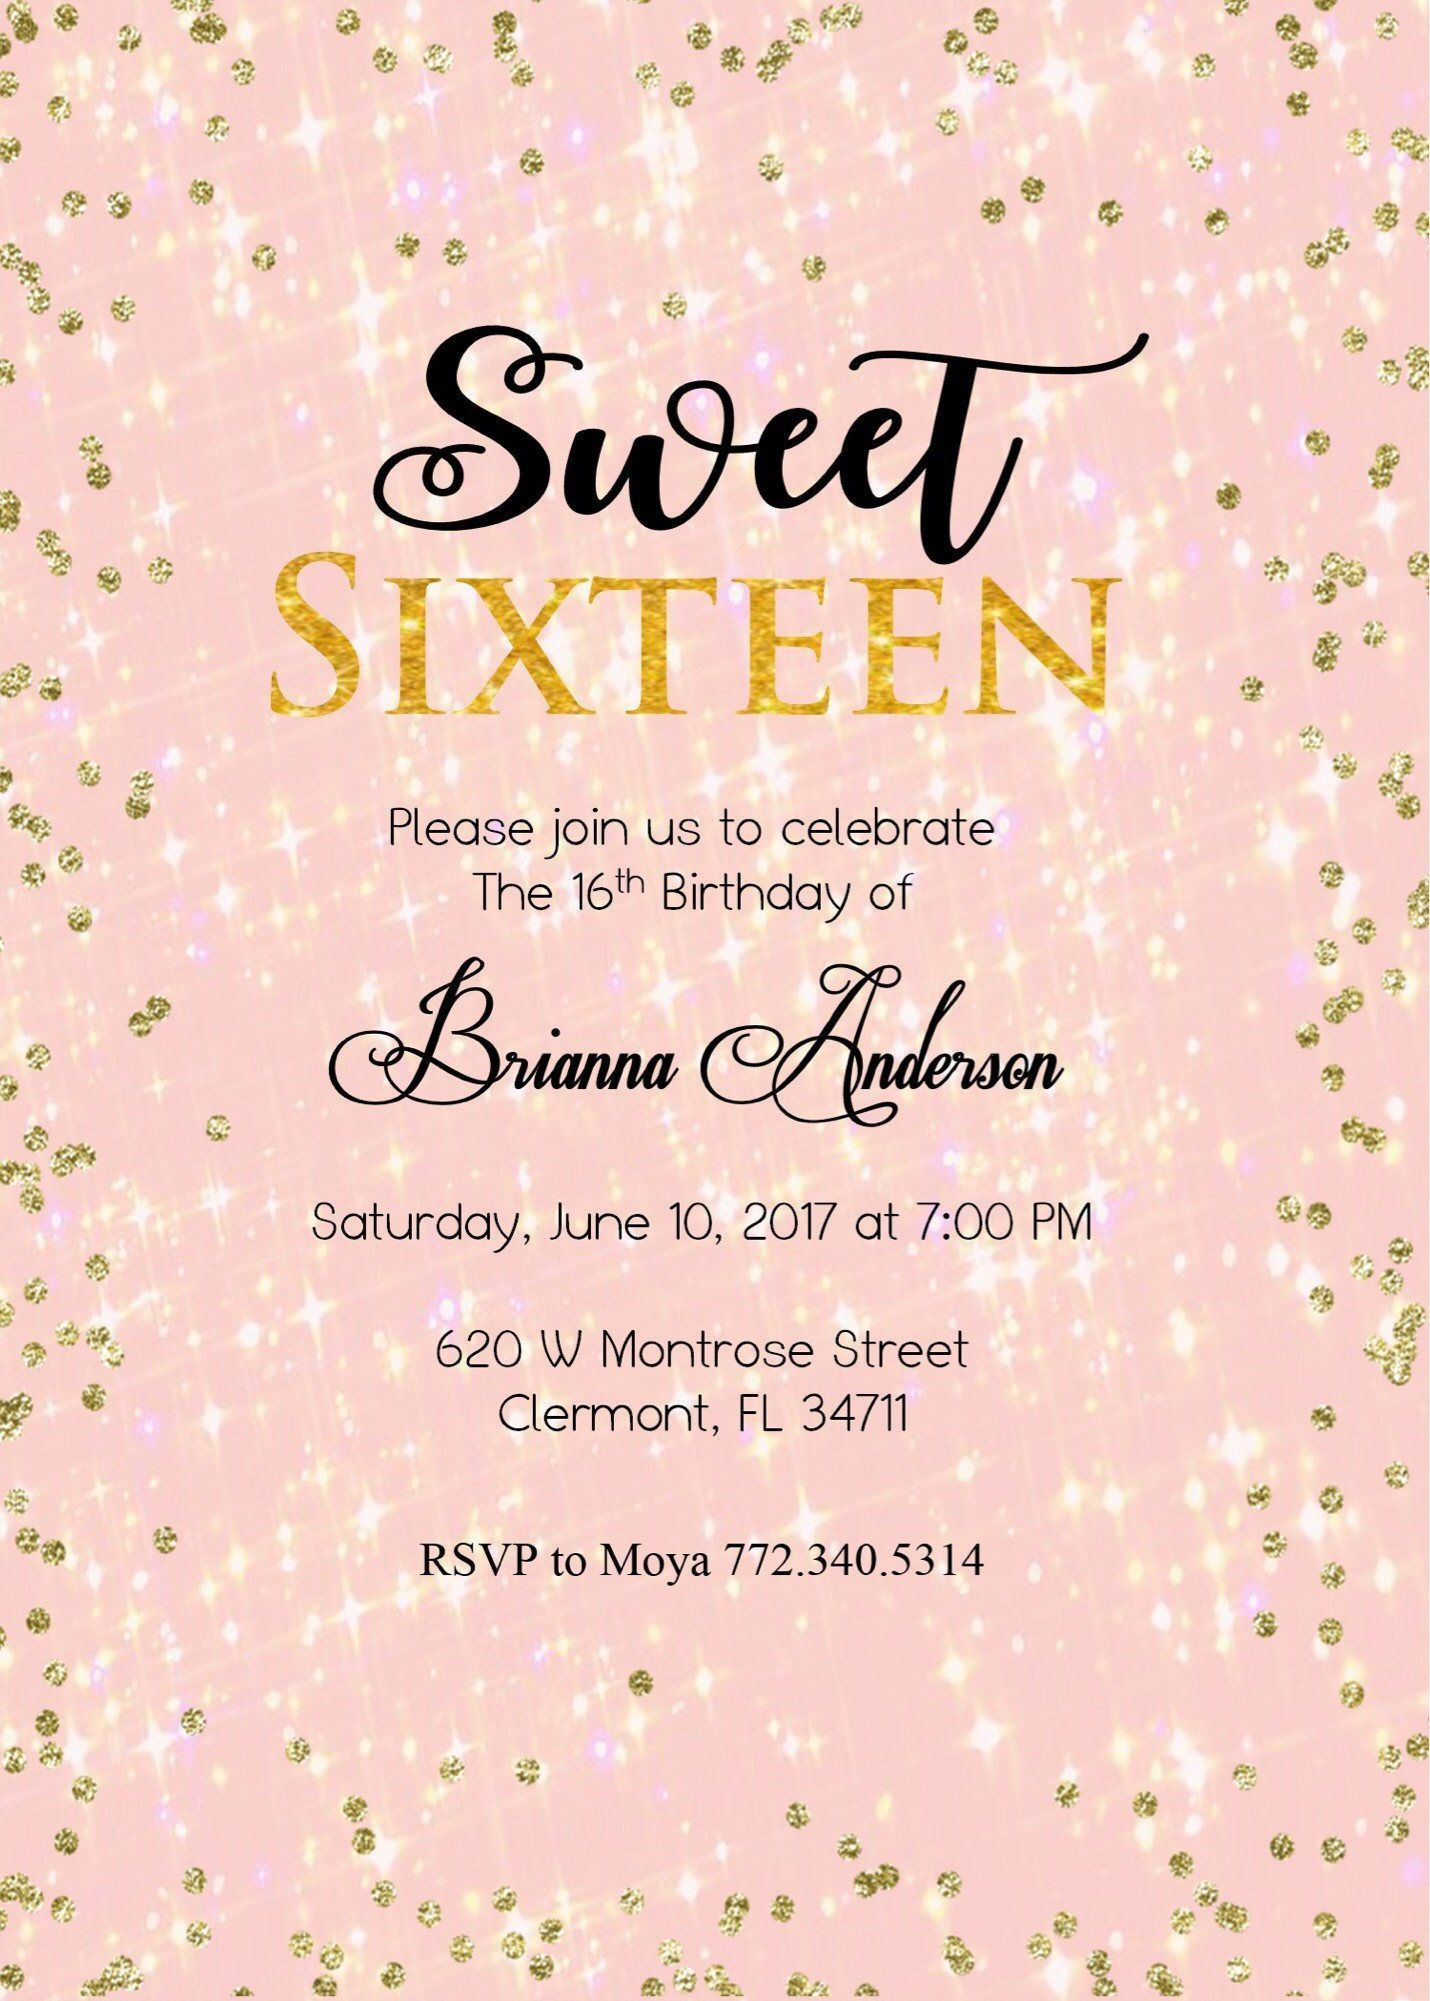 Birthday Invitation Template 16th Birthday Party Invitations Templates Fre Free Birthday Invitation Templates Party Invite Template Free Birthday Invitations